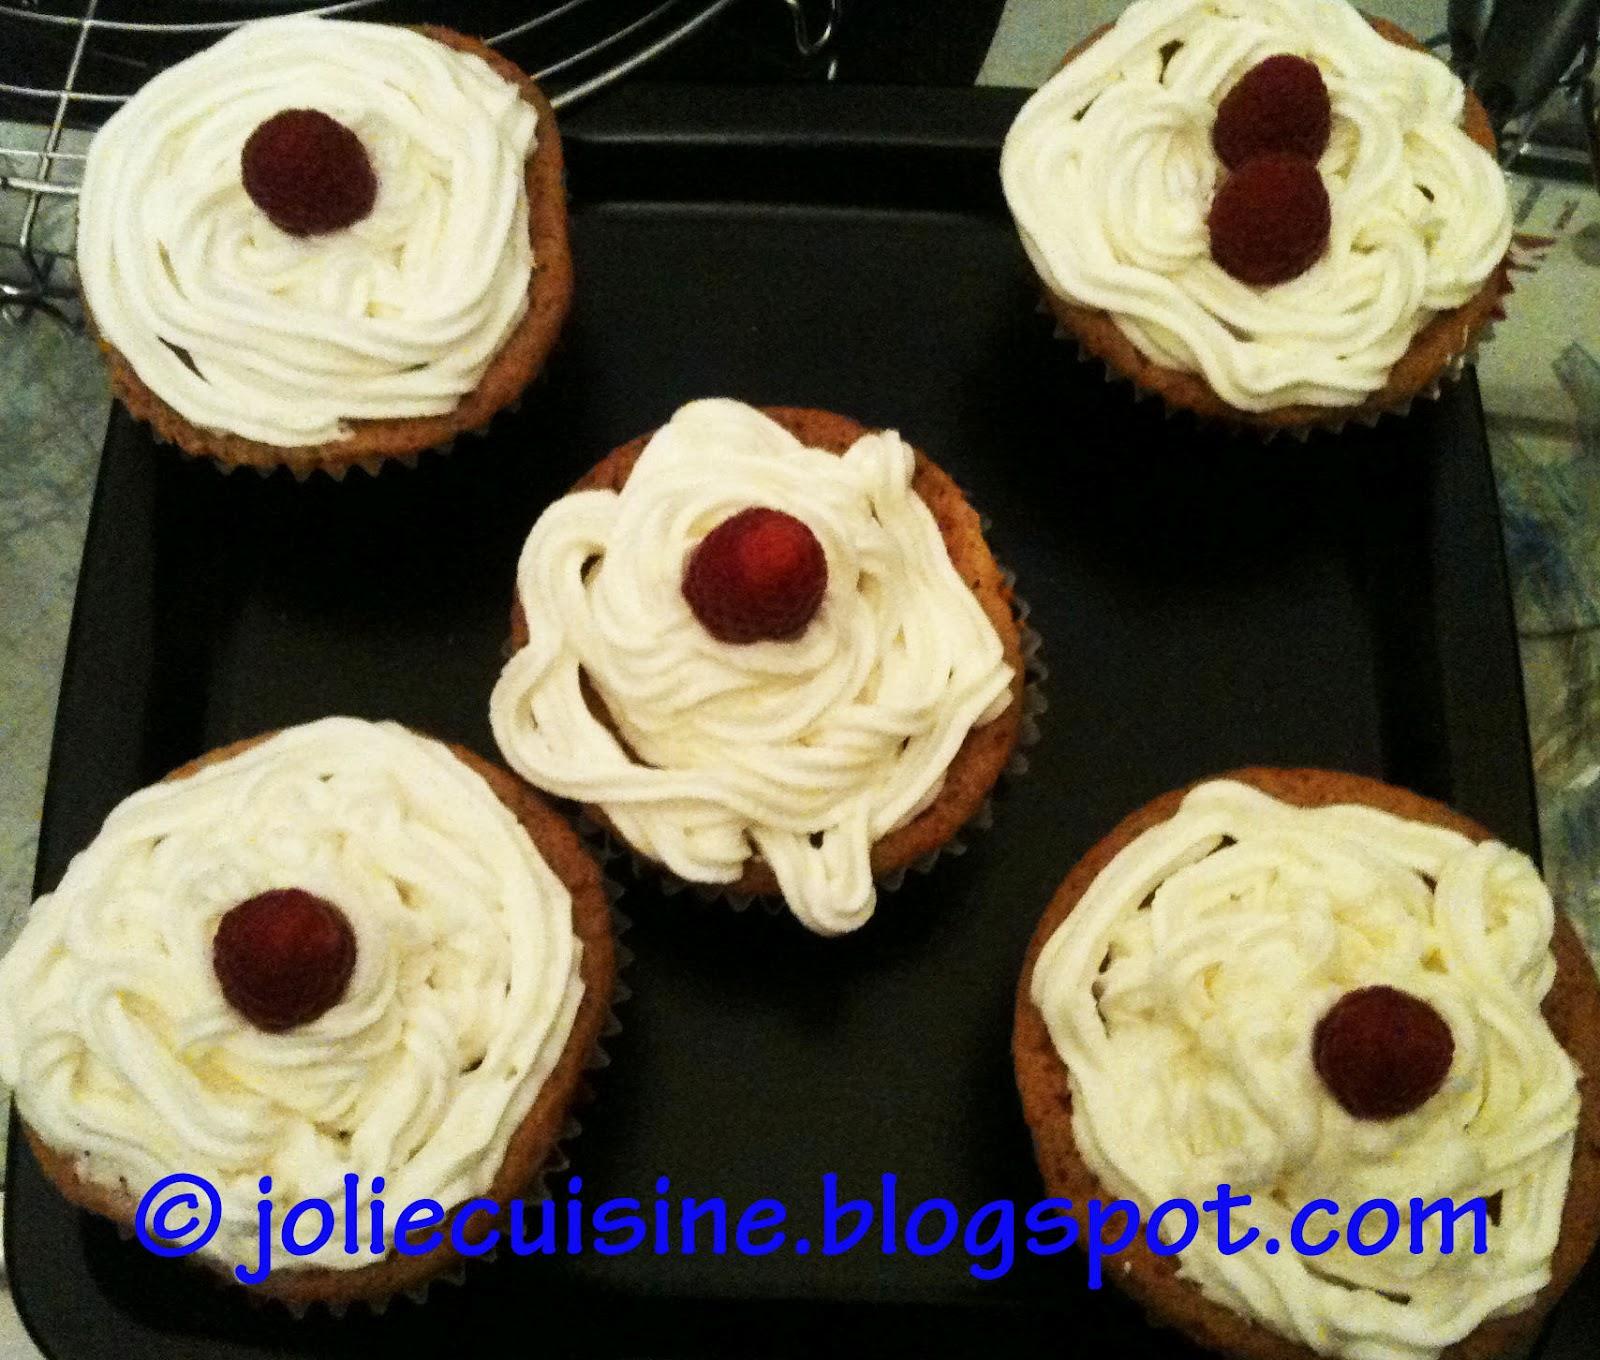 Jolie cuisine cupcake cioccolato bianco e lamponi - Jolie cupcake ...